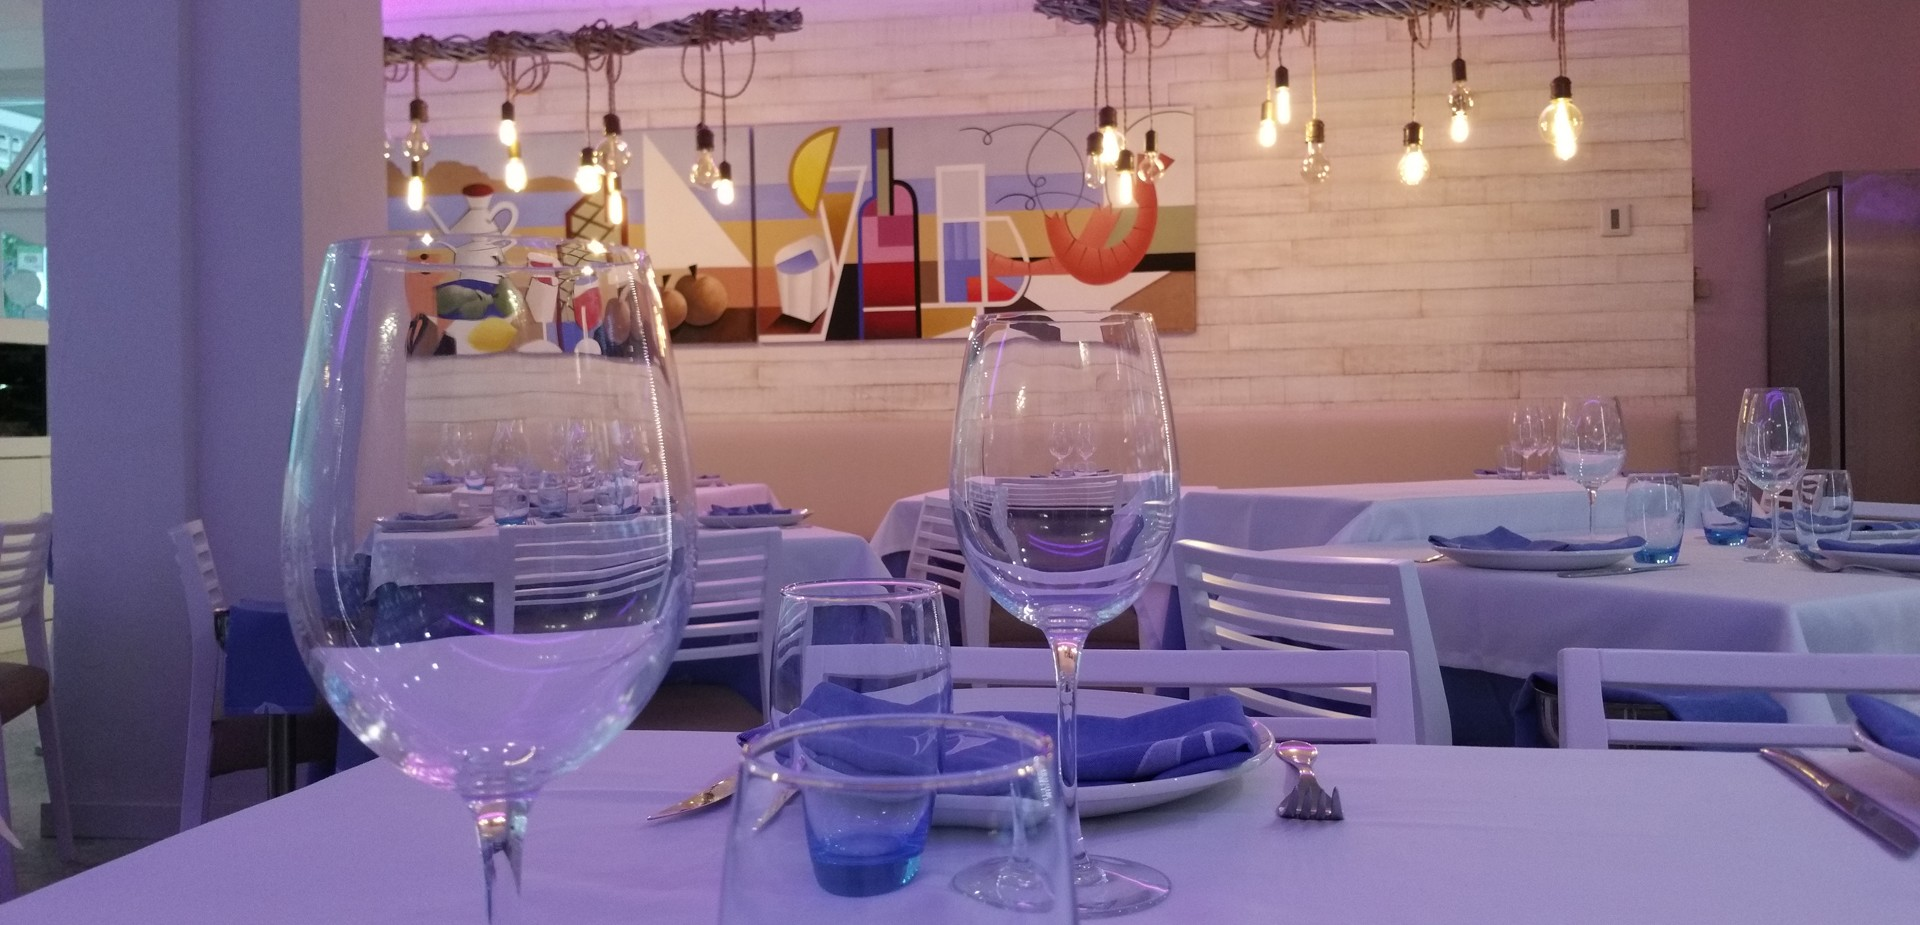 restaurante-barbados-marisqueria-valencia-01